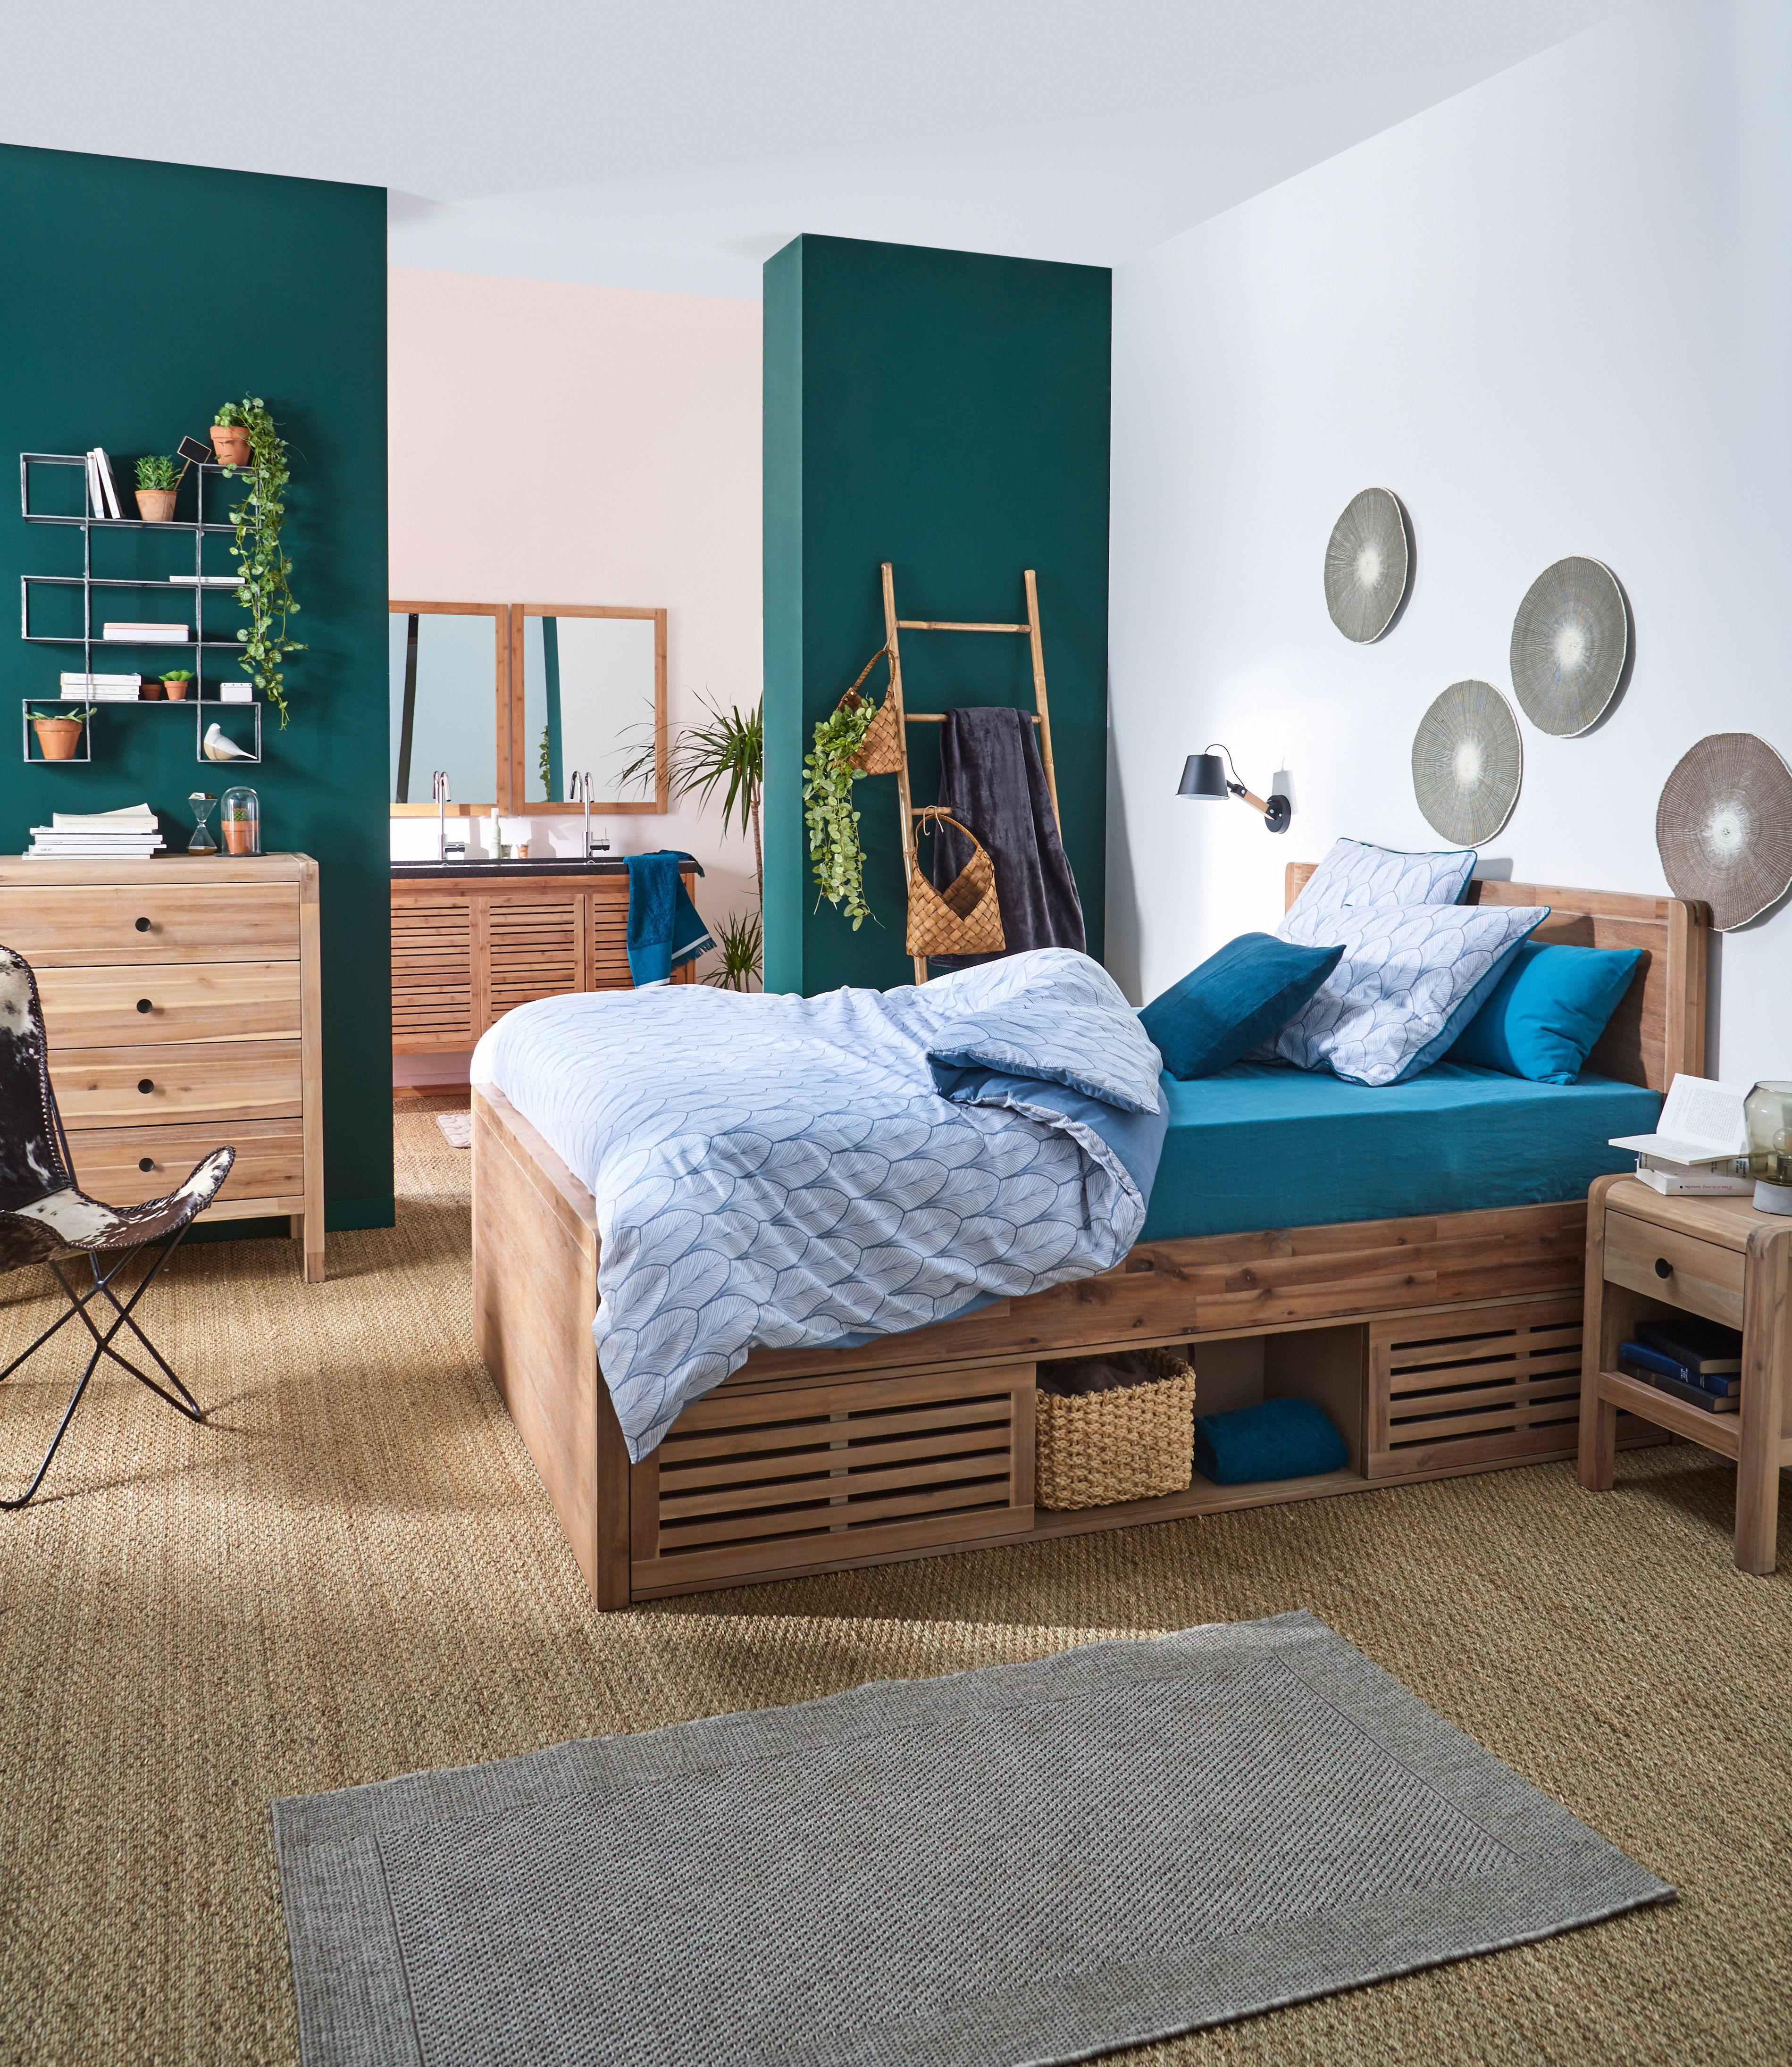 gaia chambre lit 2 places en acacia avec t te de lit alin a prendre soin de soi chambre. Black Bedroom Furniture Sets. Home Design Ideas